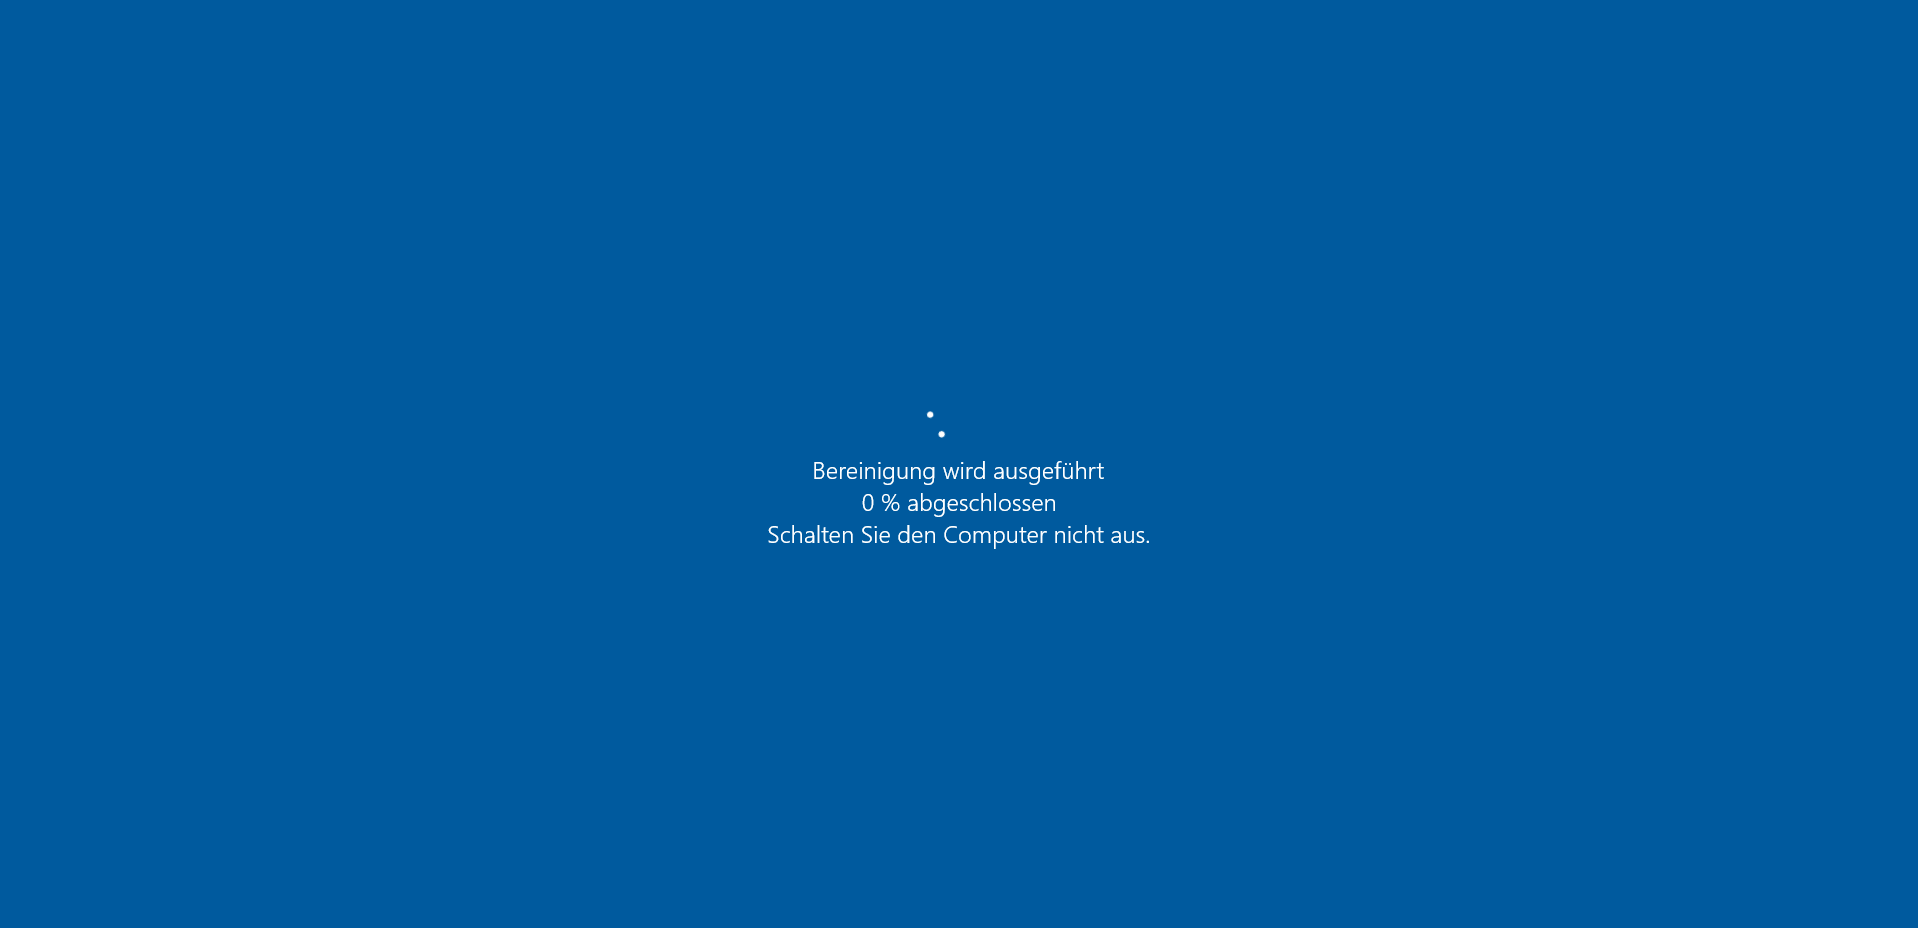 [Bild: Windows+10+x64-2019-08-25-00-27-28.png]